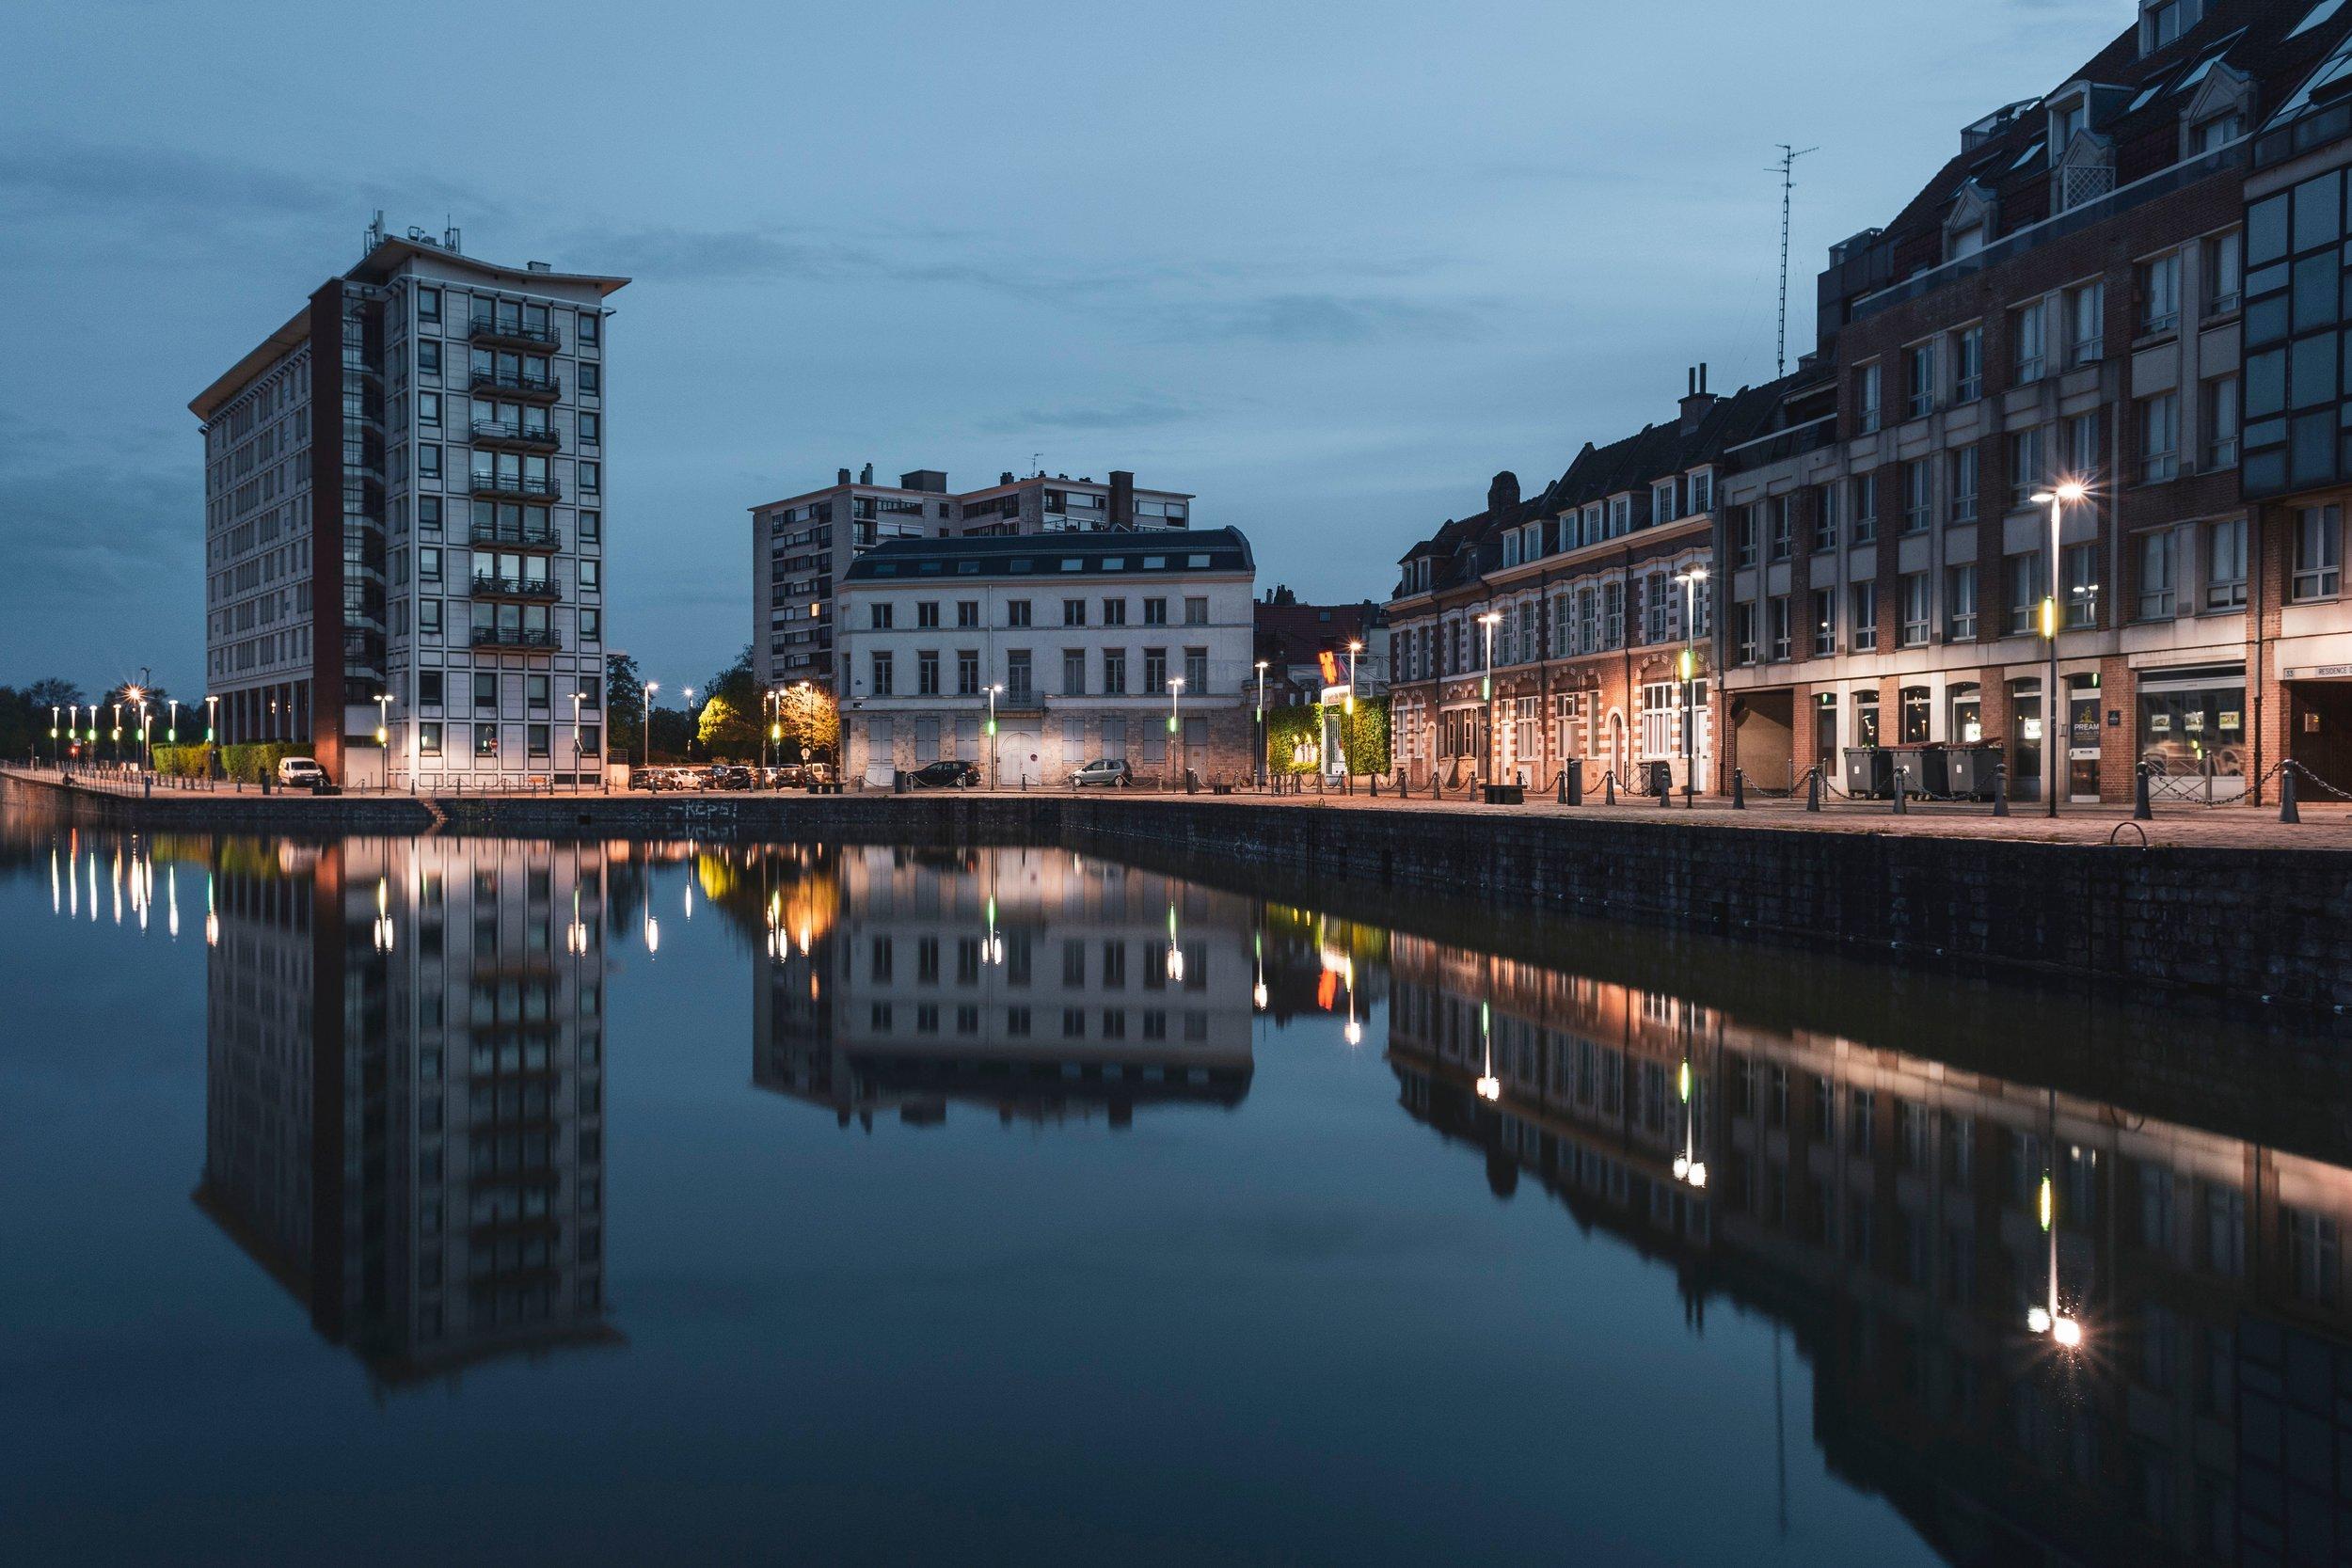 Quai du Wault in Lille, France. Photo by  Geoffroy Hauwen  on  Unsplash